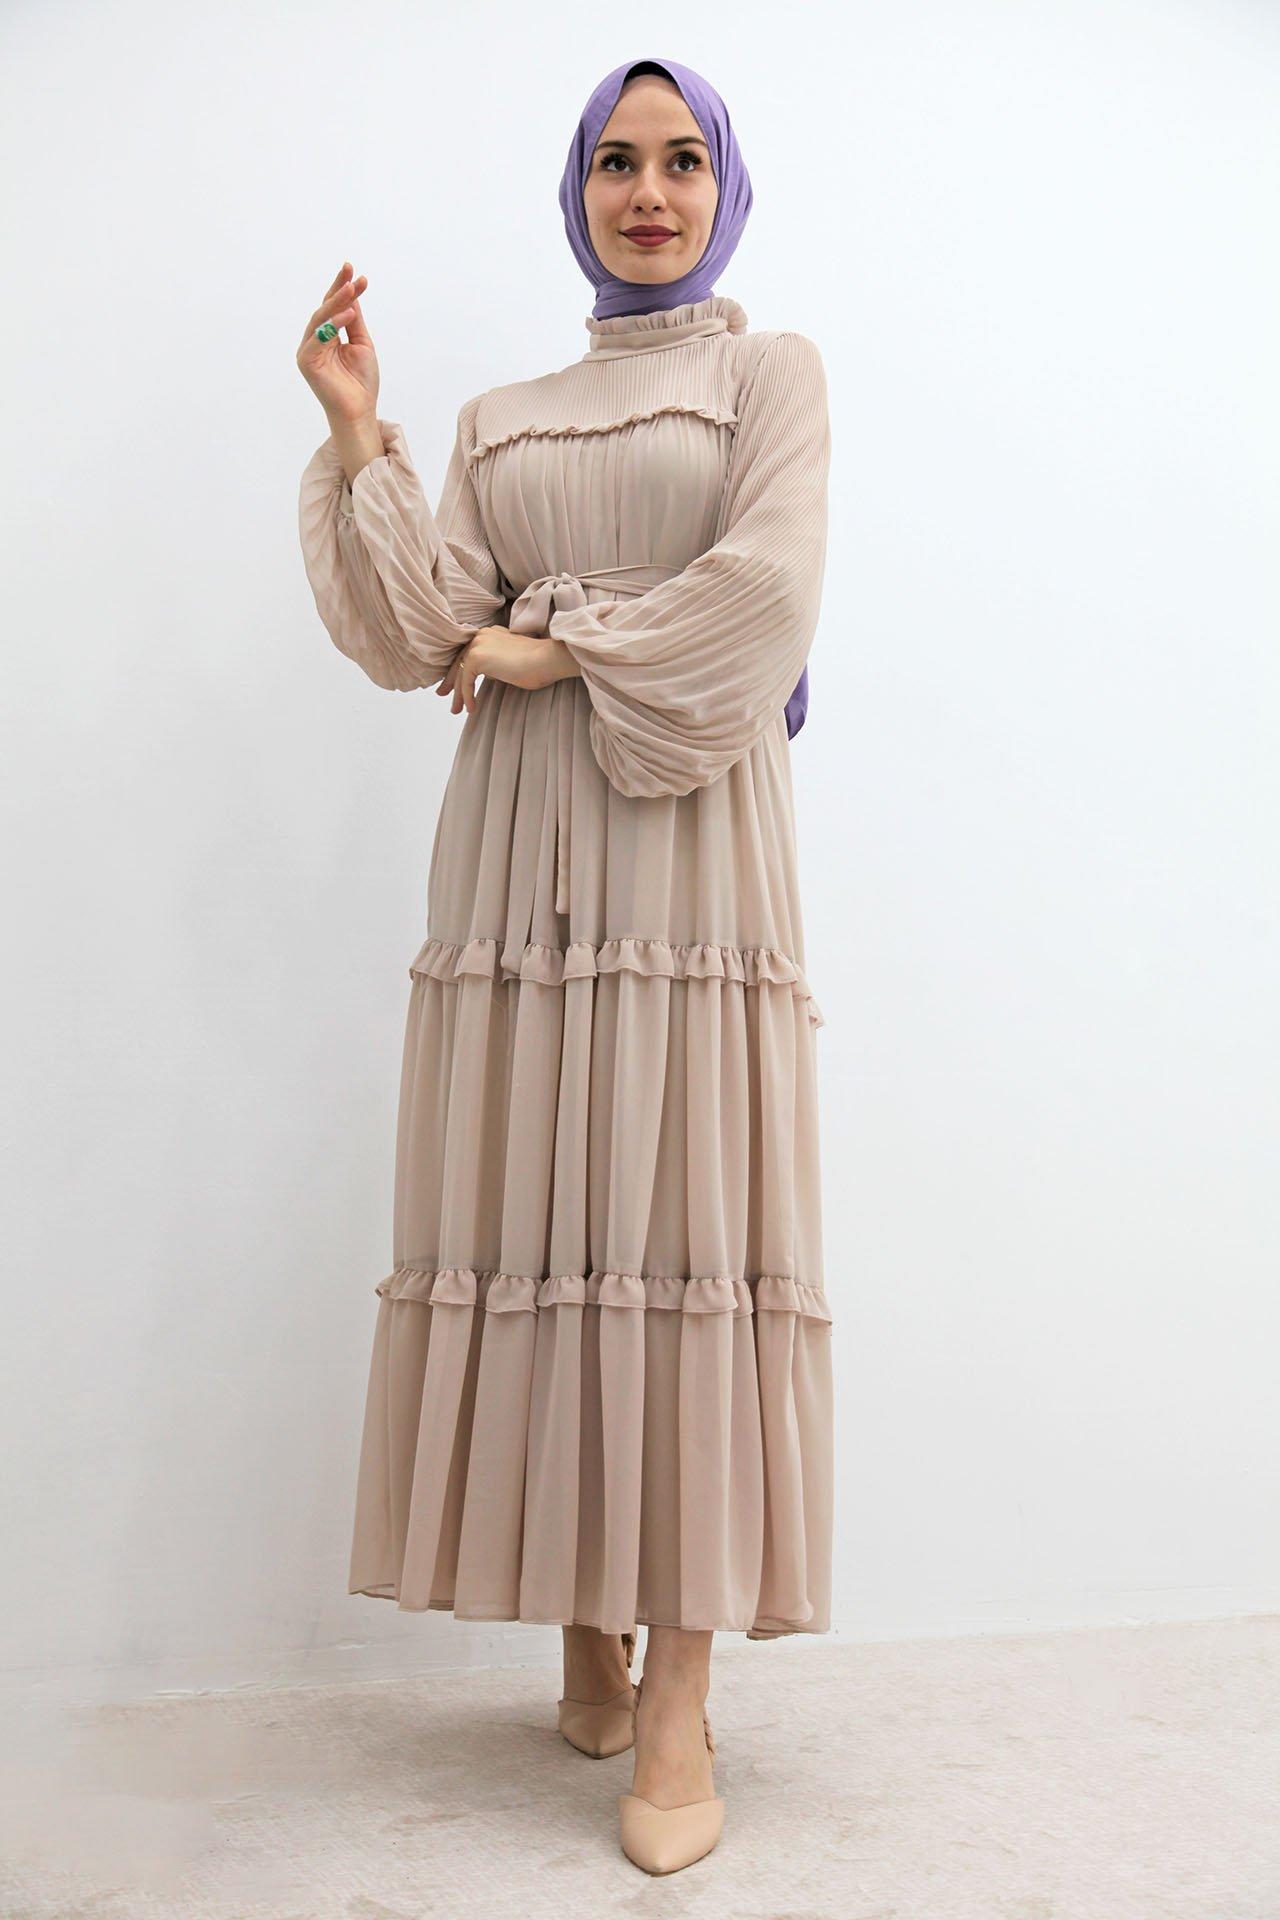 GİZAGİYİM - Fırfırlı Pilisoley Şifon Elbise Krem